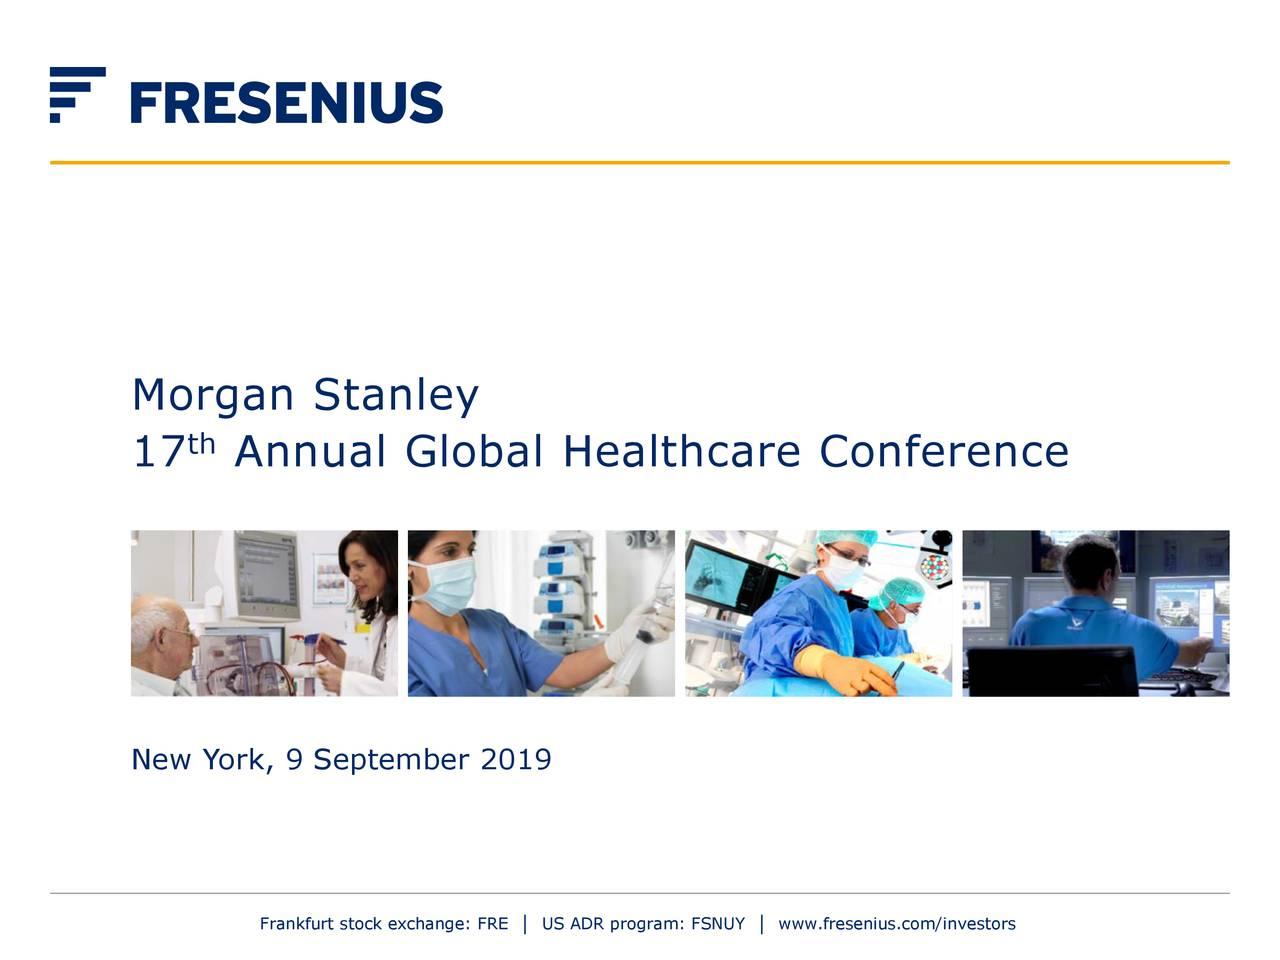 Fresenius SE & Co  KGaA (FSNUY) Presents At Morgan Stanley